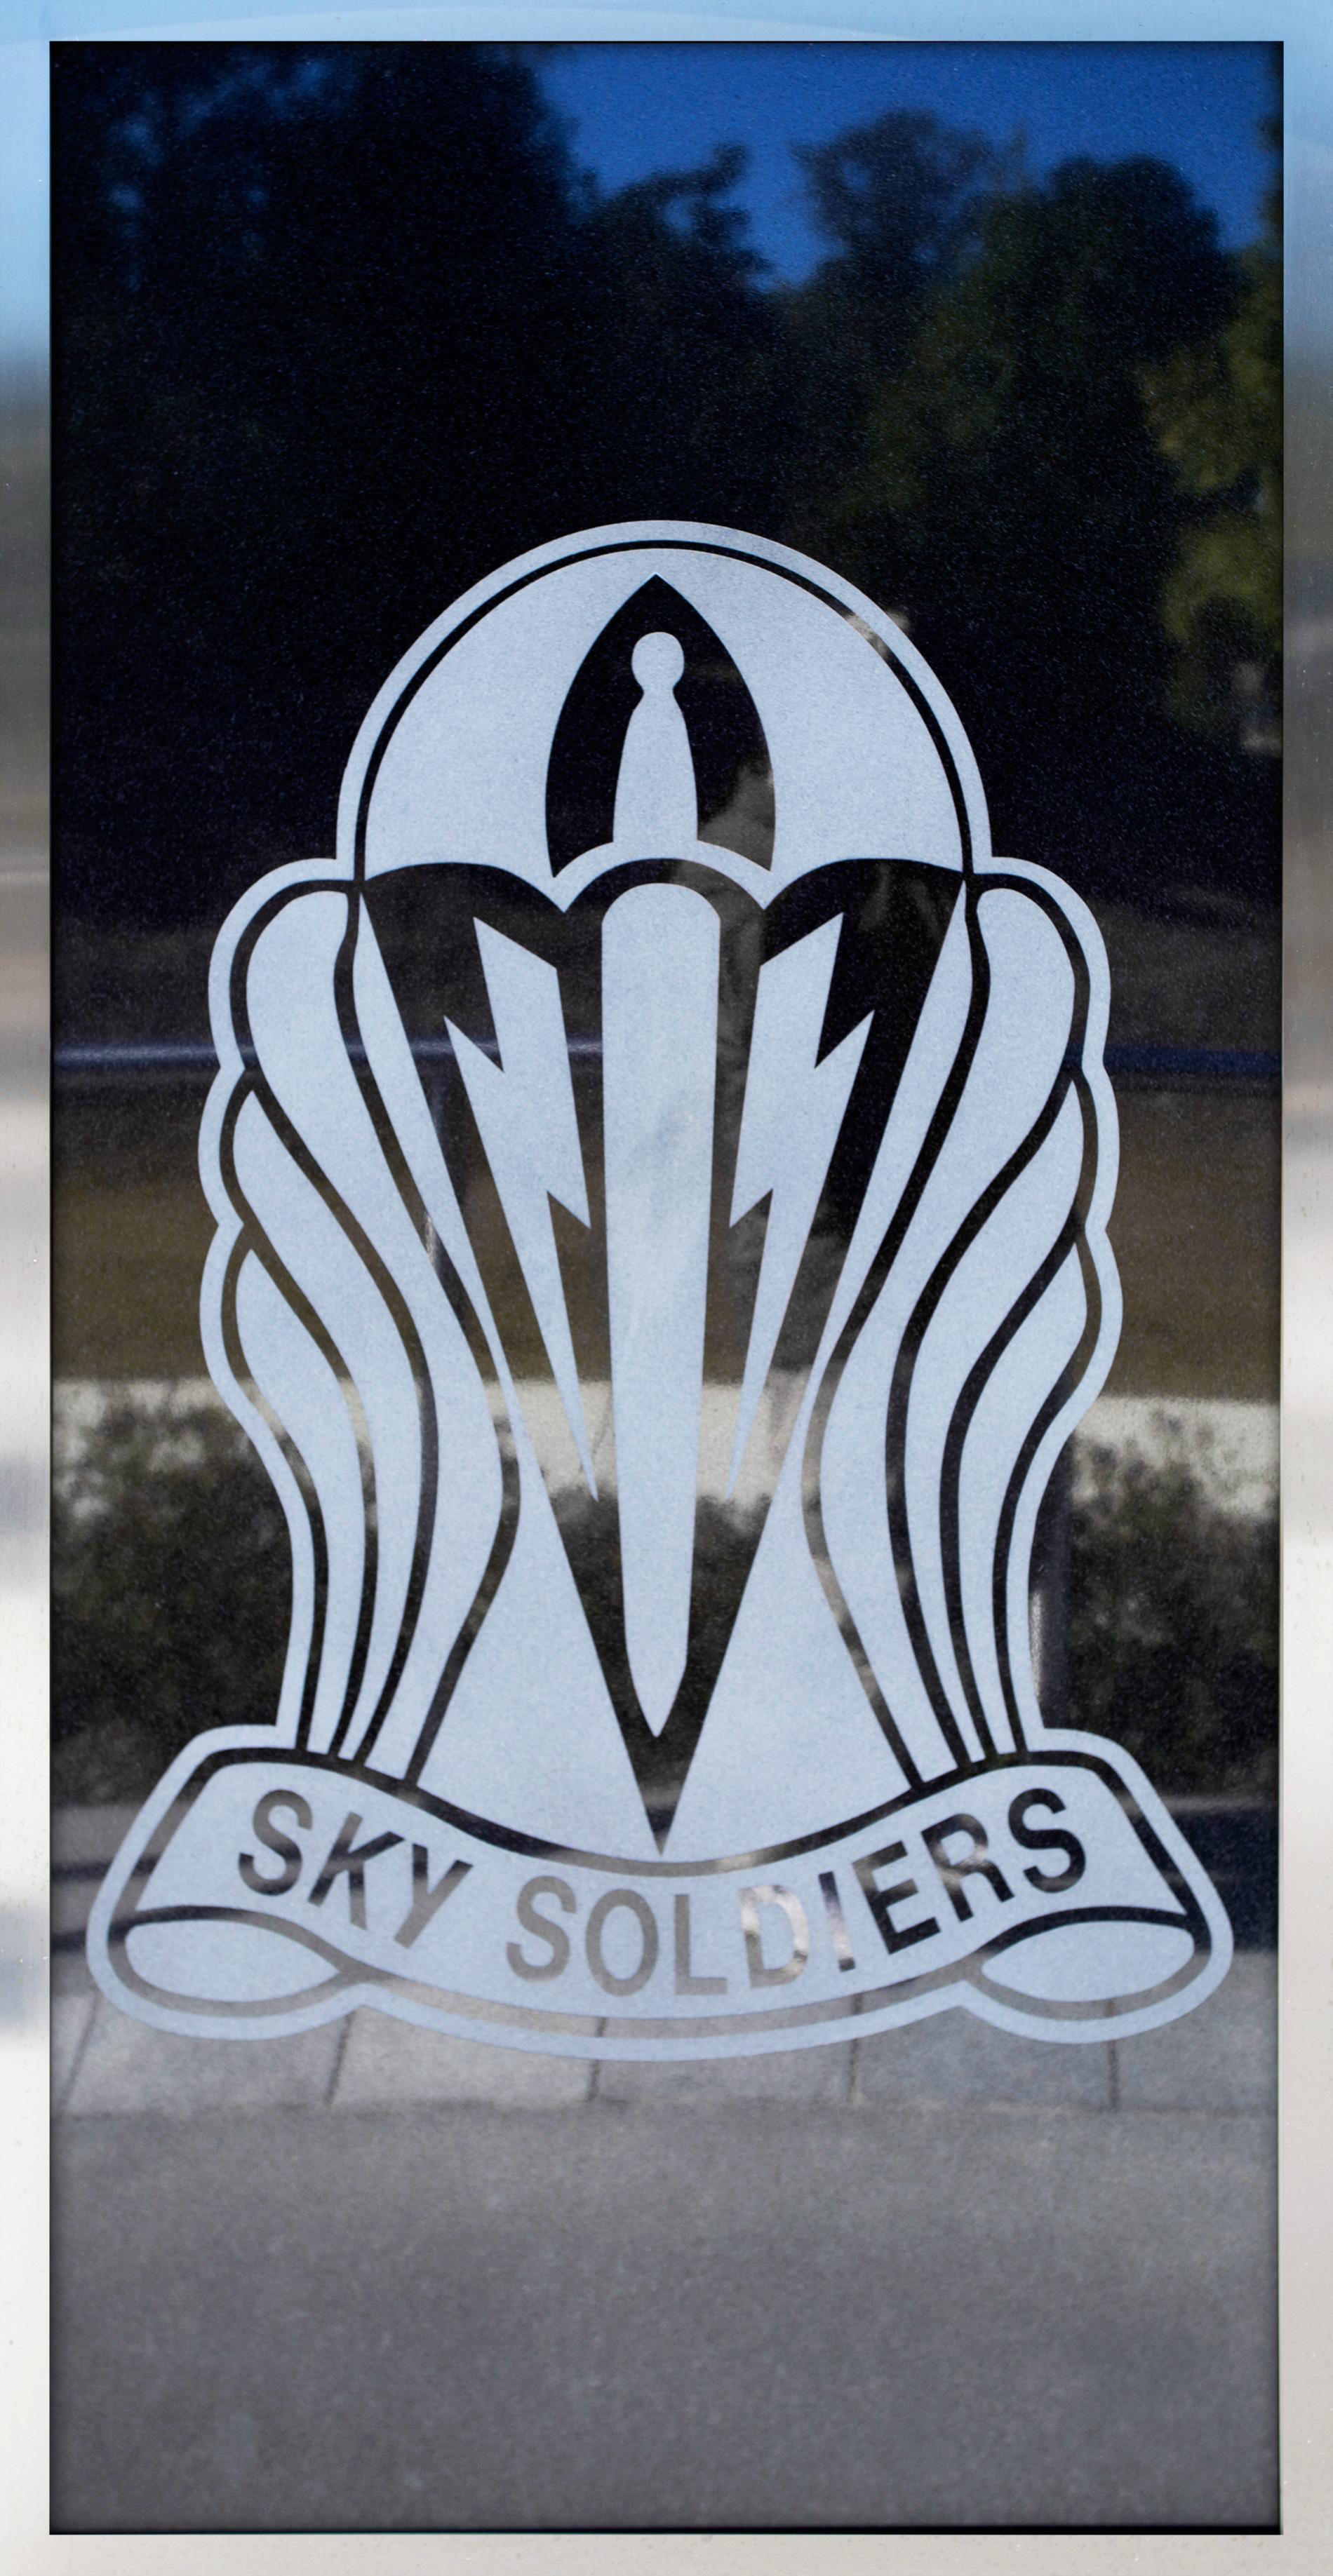 Sky Soldiers Memorial